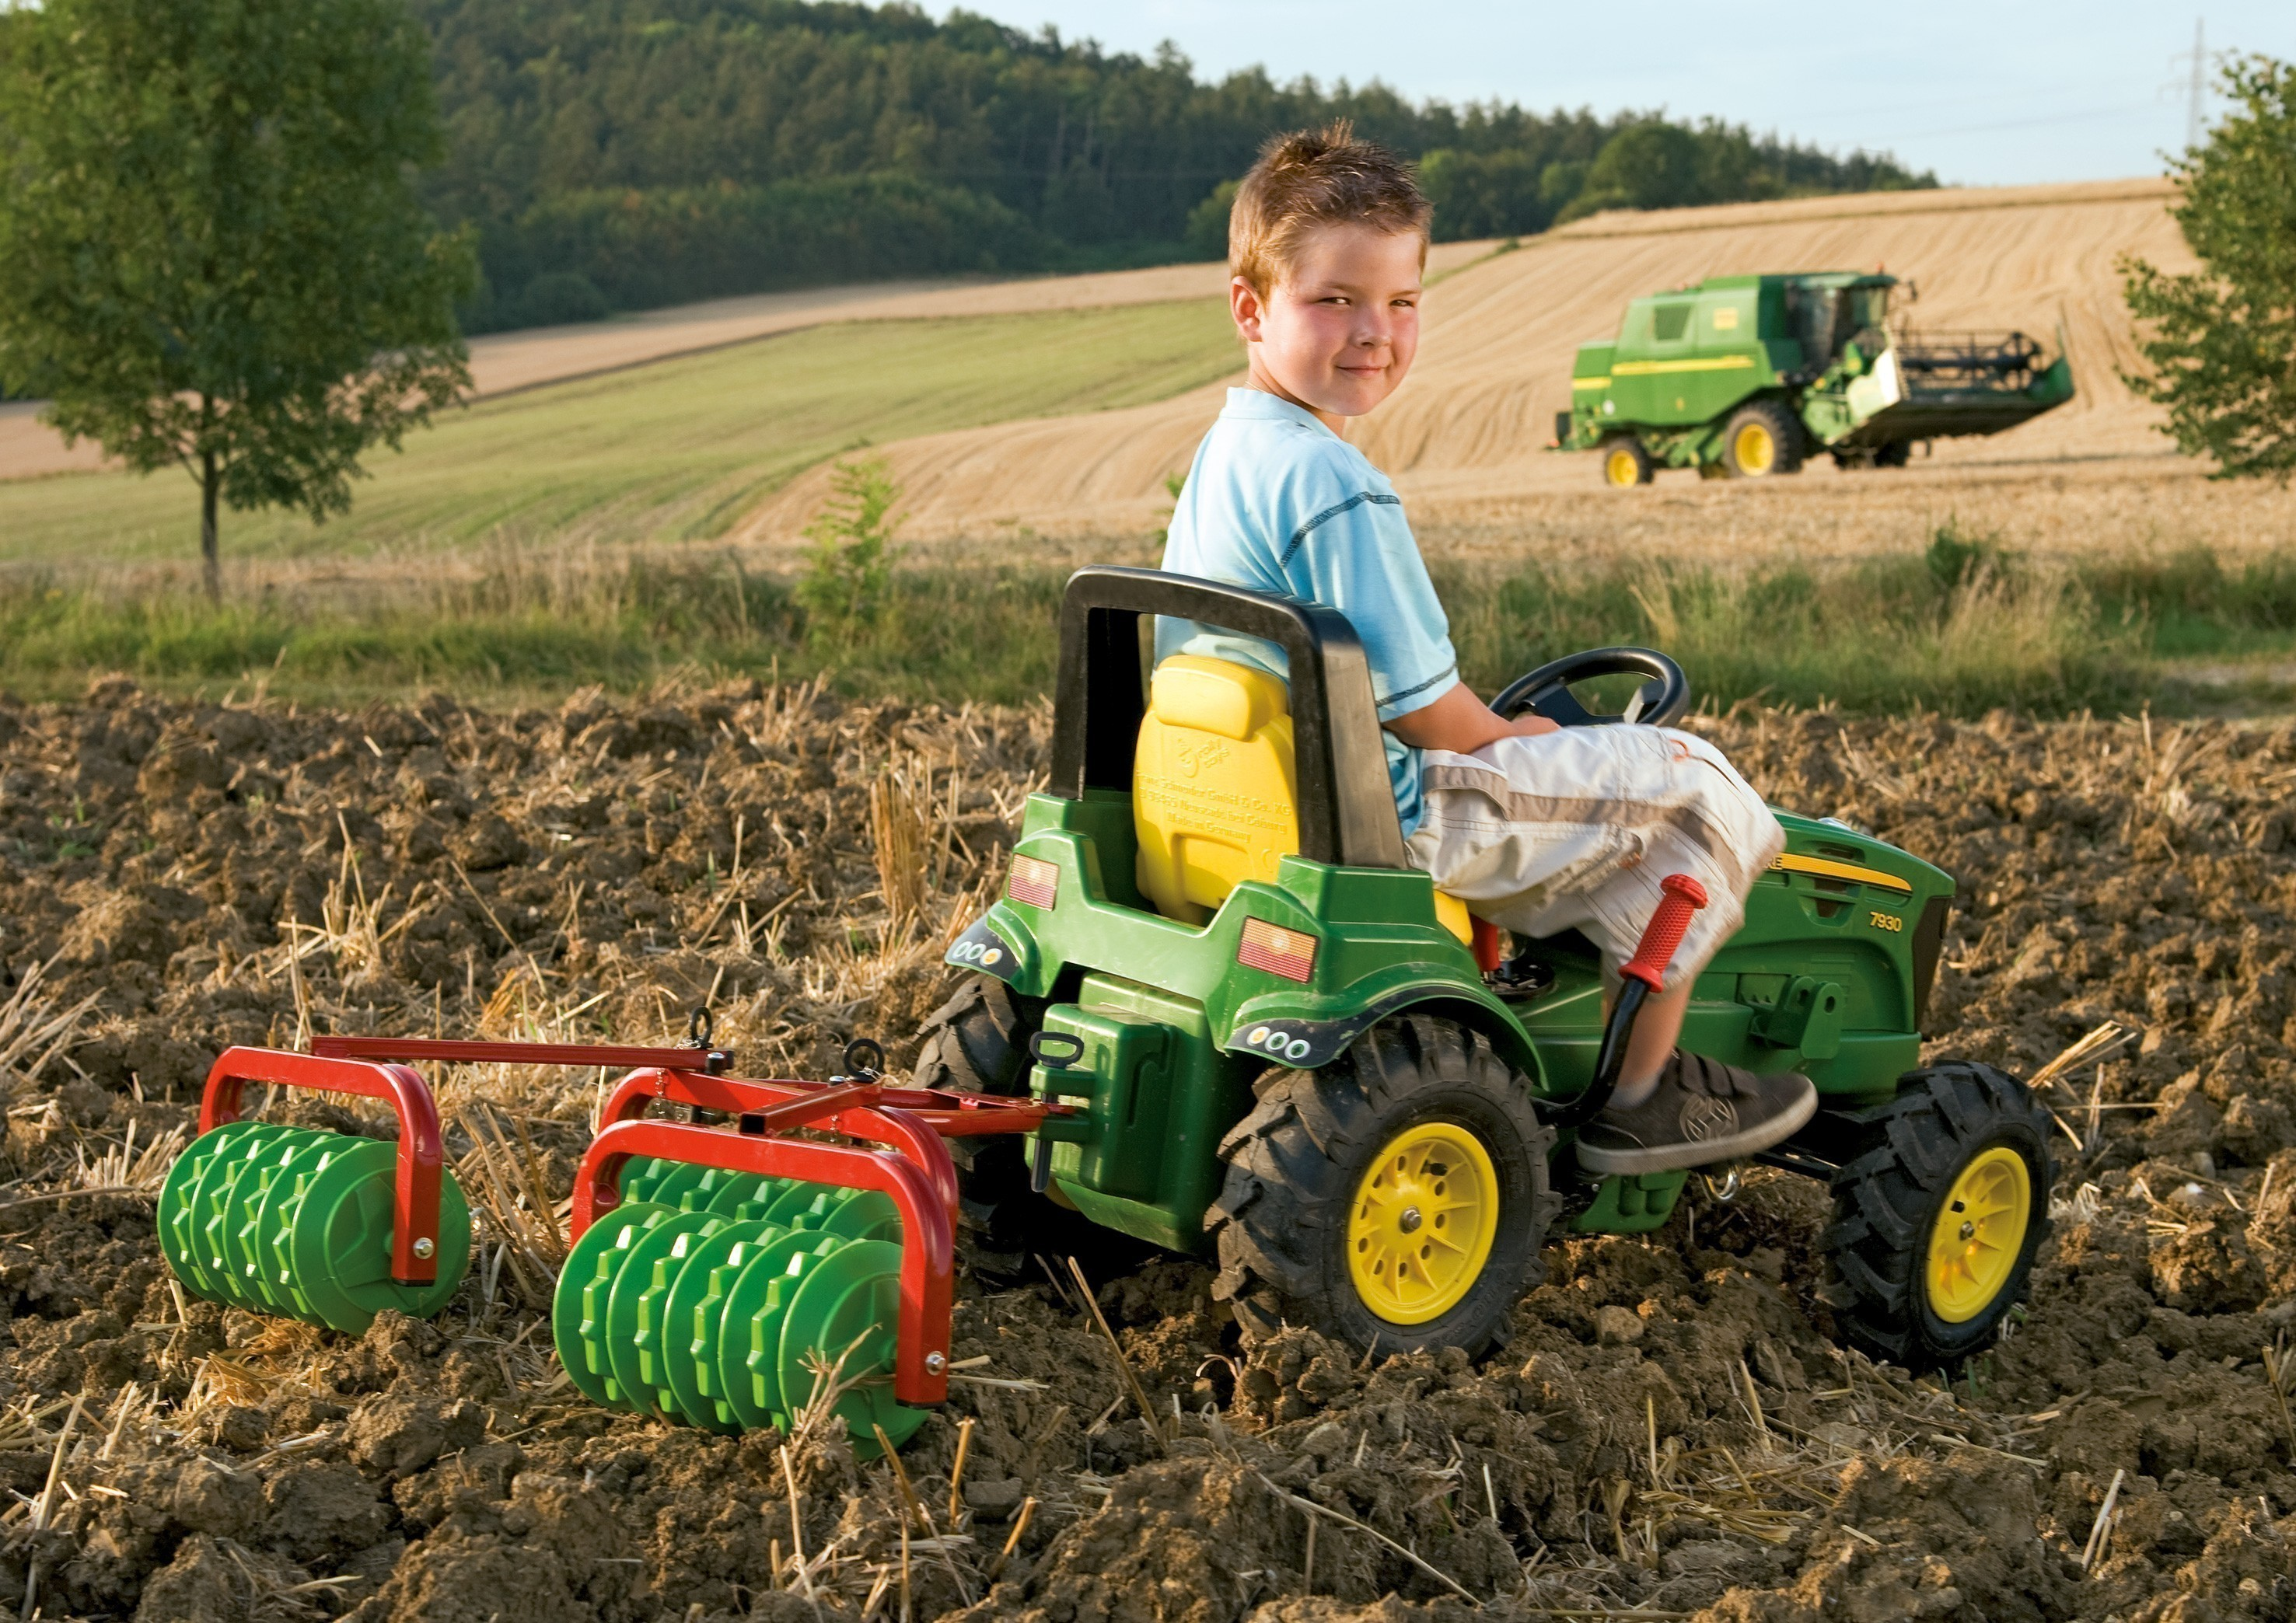 Cambridge Walze für Tretfahrzeuge - Rolly Toys Bild 2